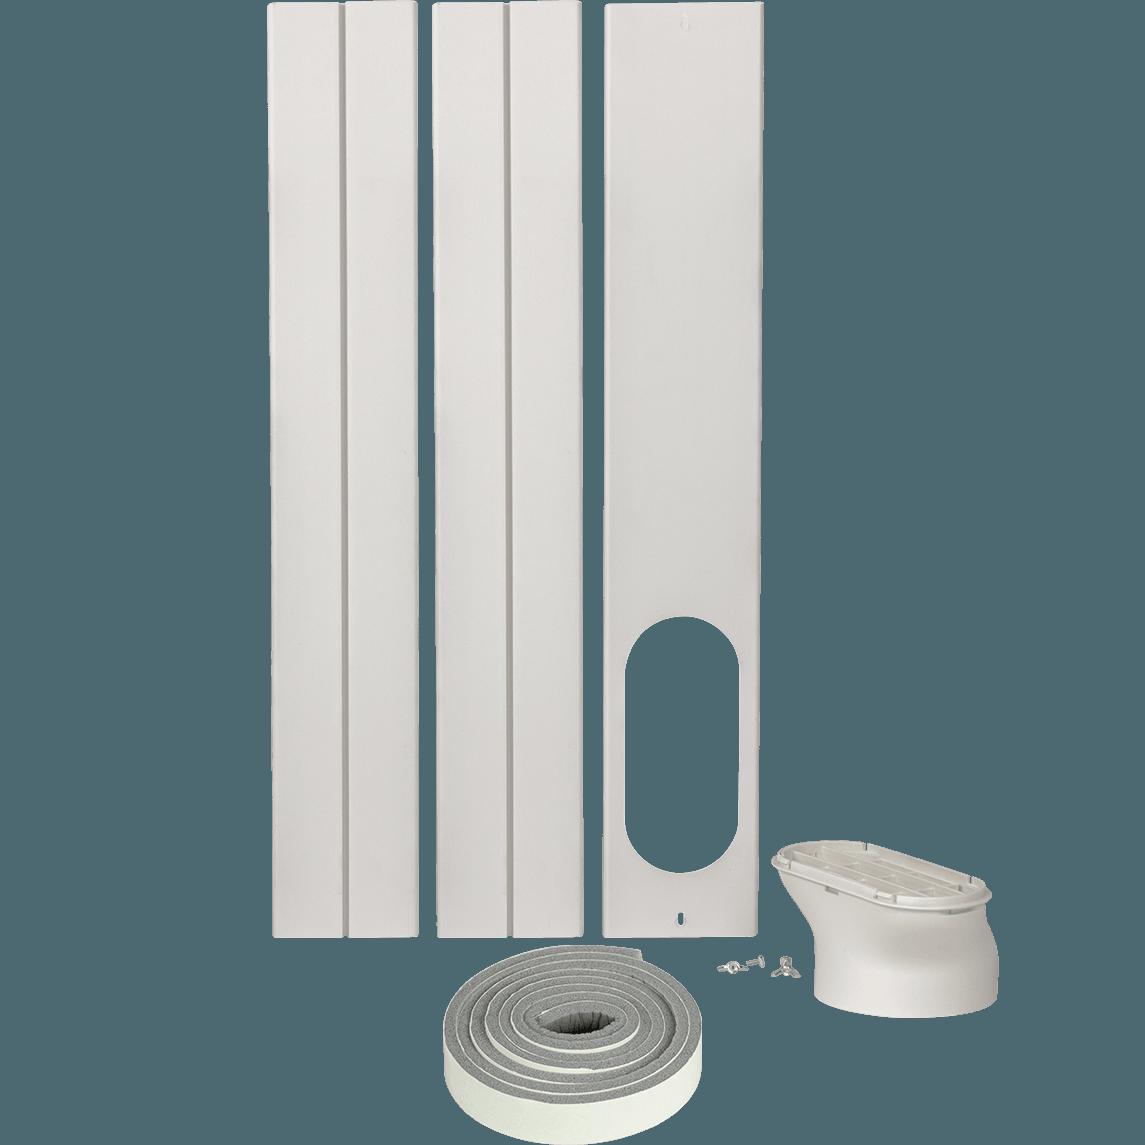 Buy Cheap Honeywell Portable Ac Sliding Glass Door Kit A 4239 300 P In 2020 Door Kits Glass Door Sliding Glass Door